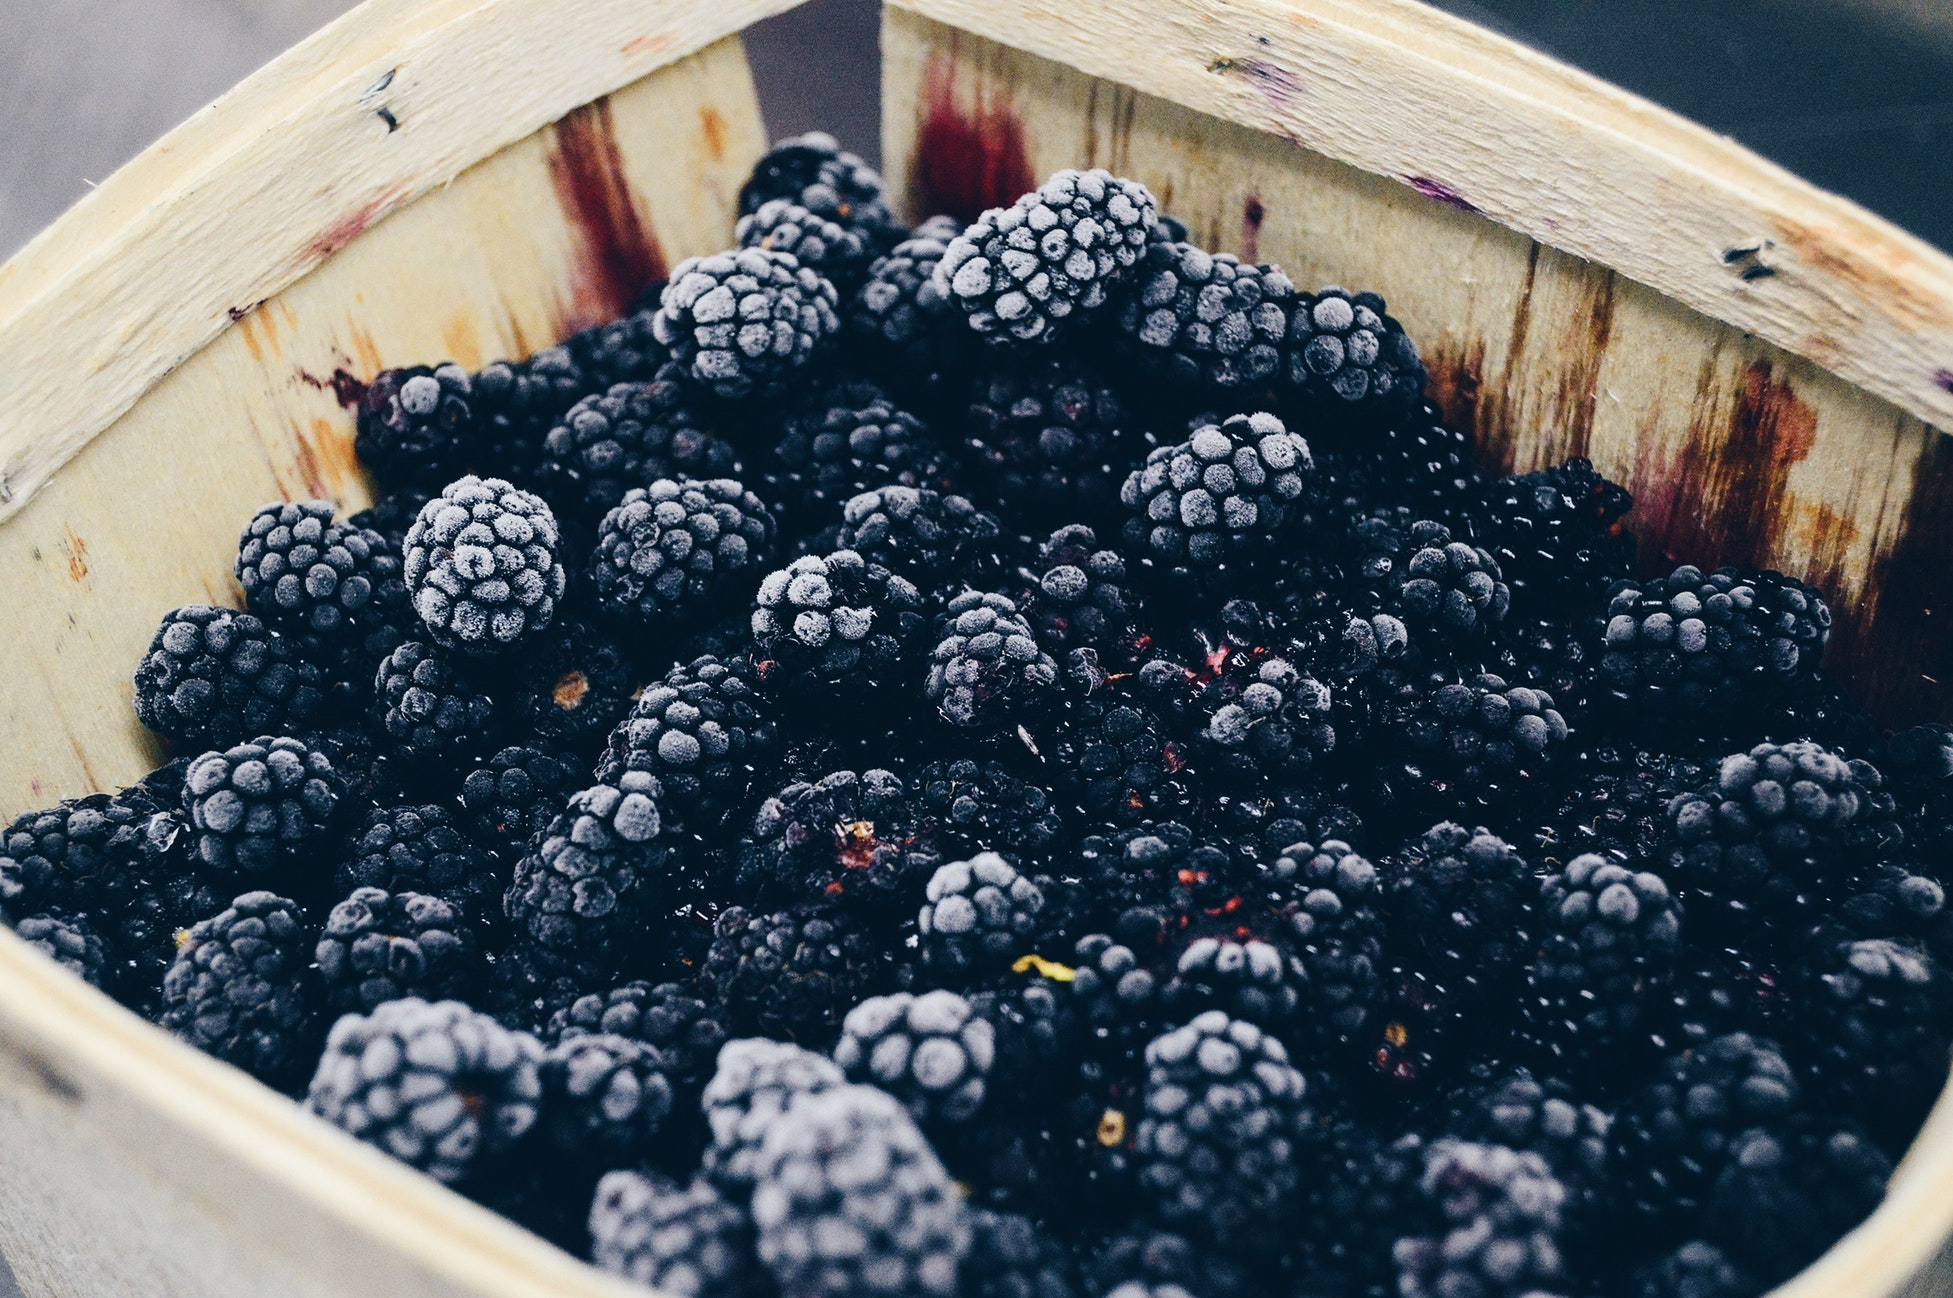 blackberries-makingitrealinc.jpg